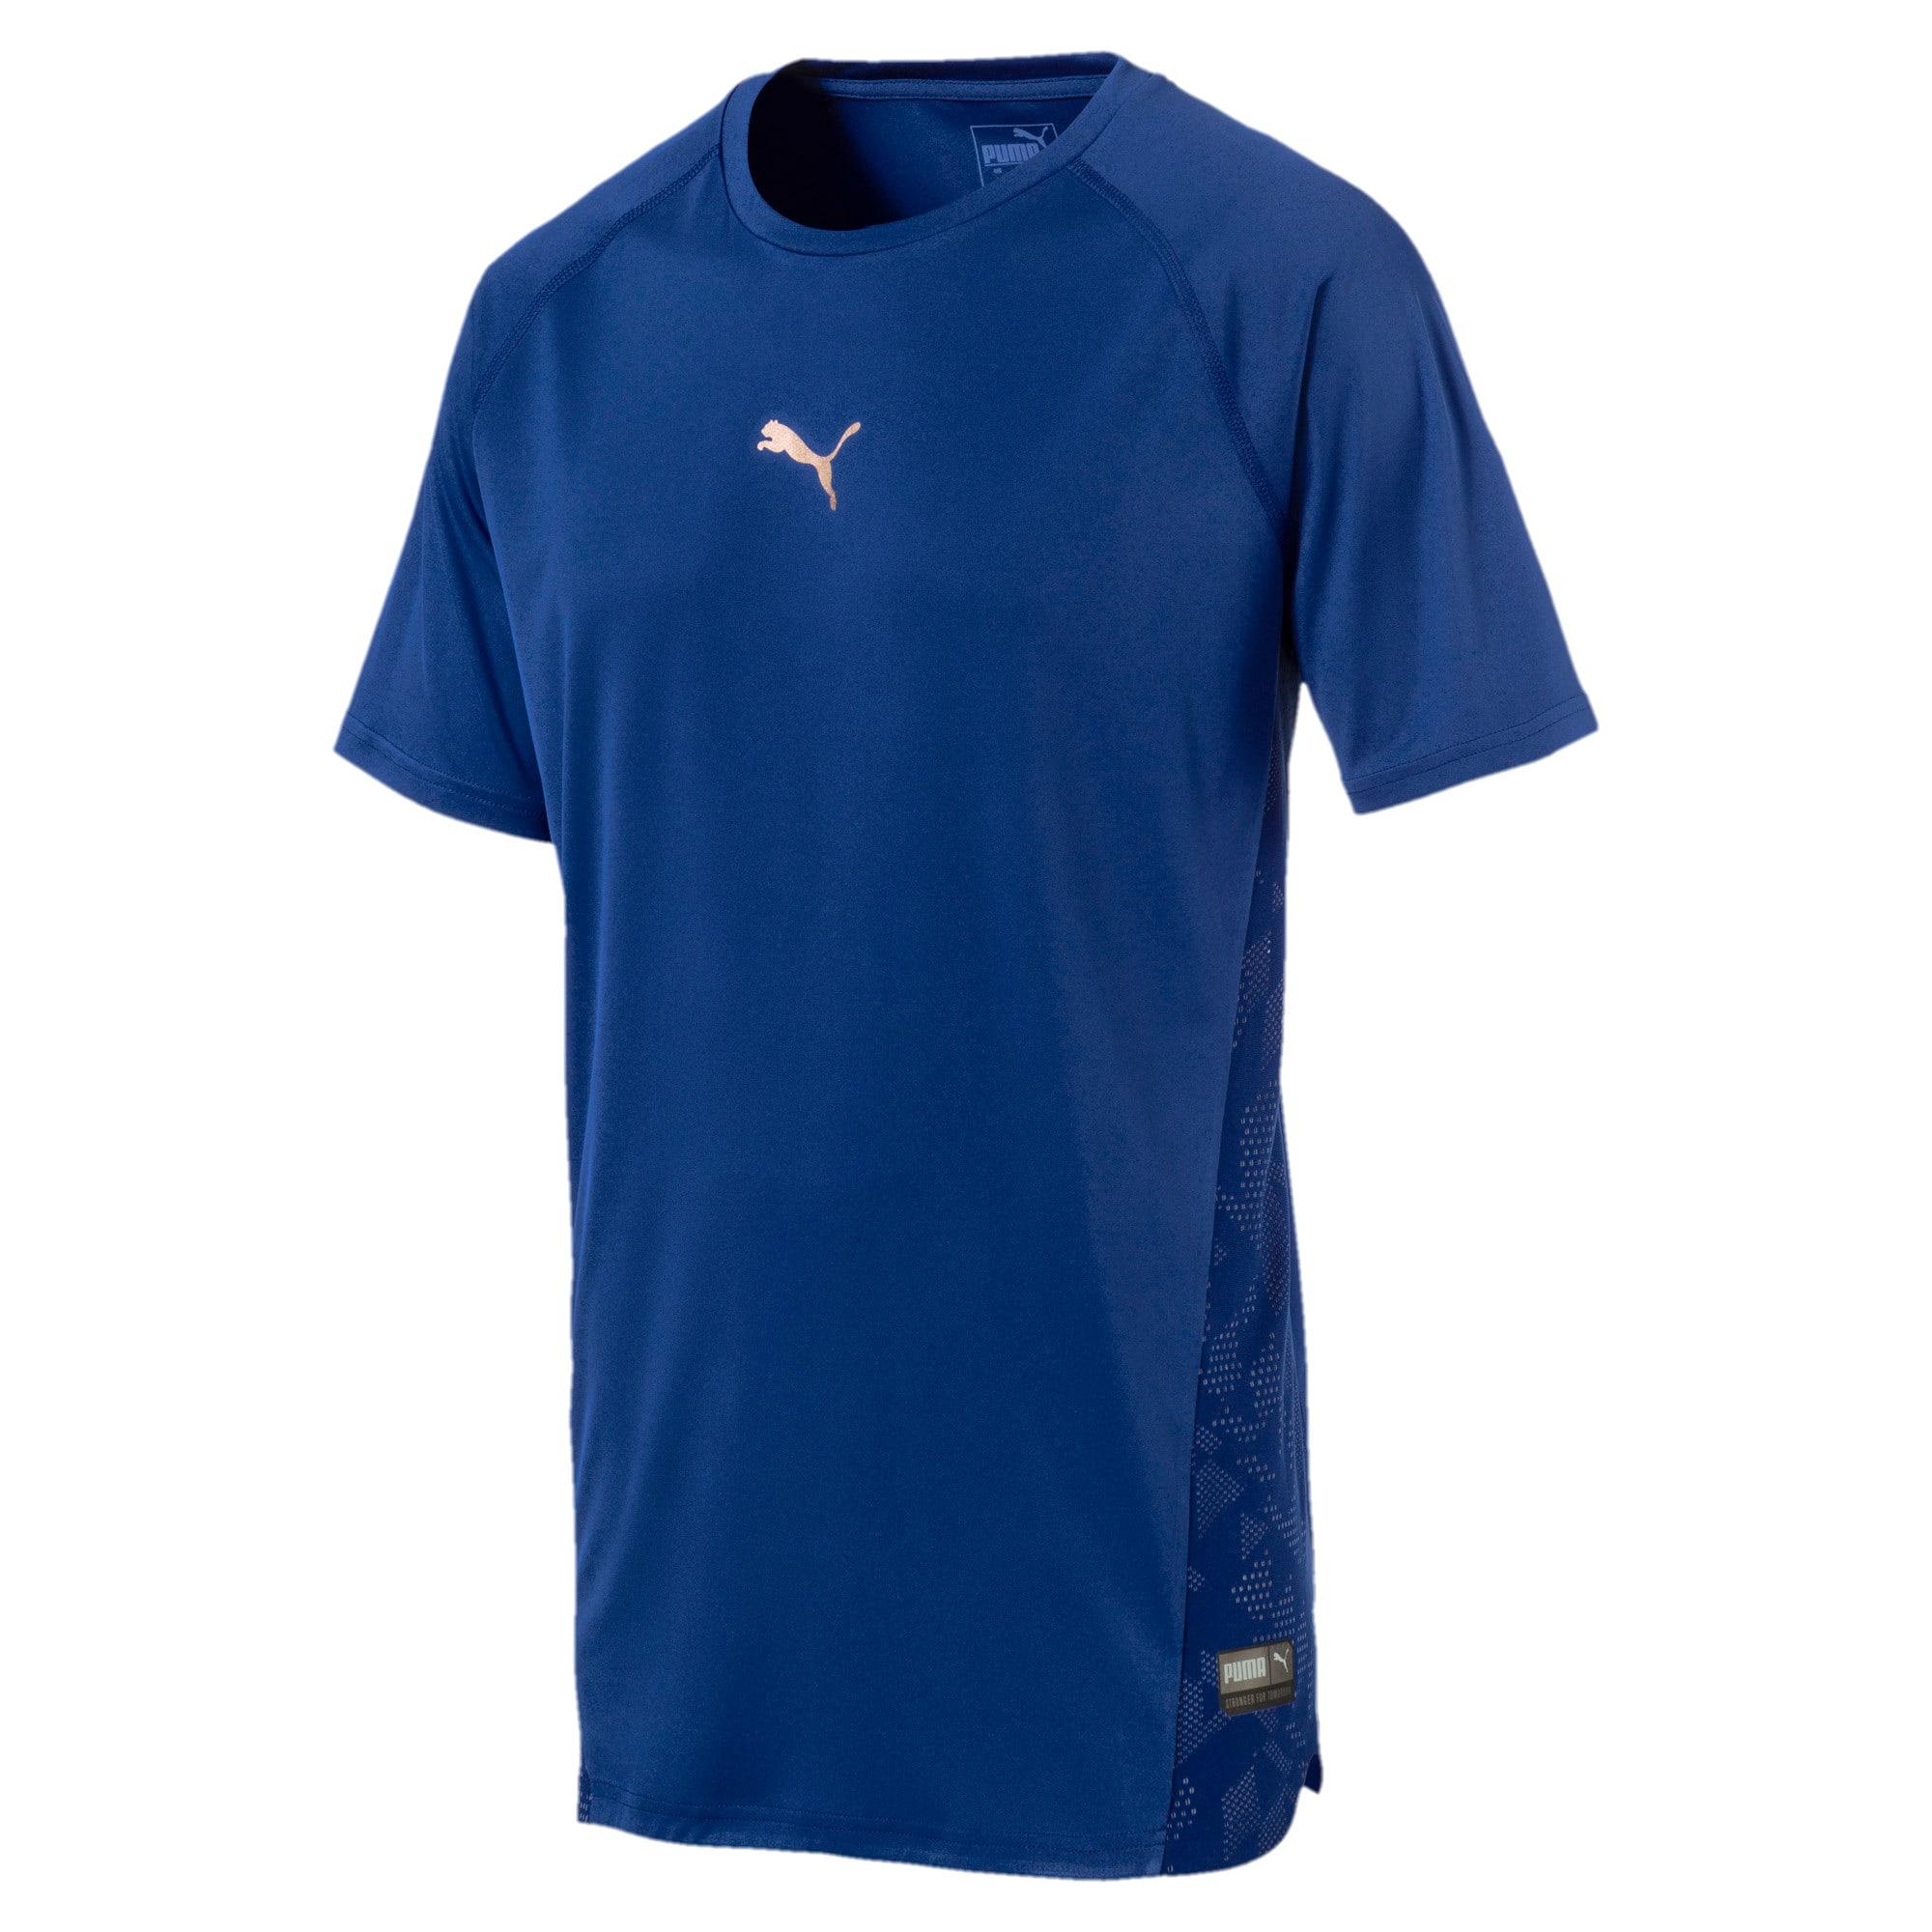 Thumbnail 1 of VENT Short Sleeve Men's Training Top, Sodalite Blue, medium